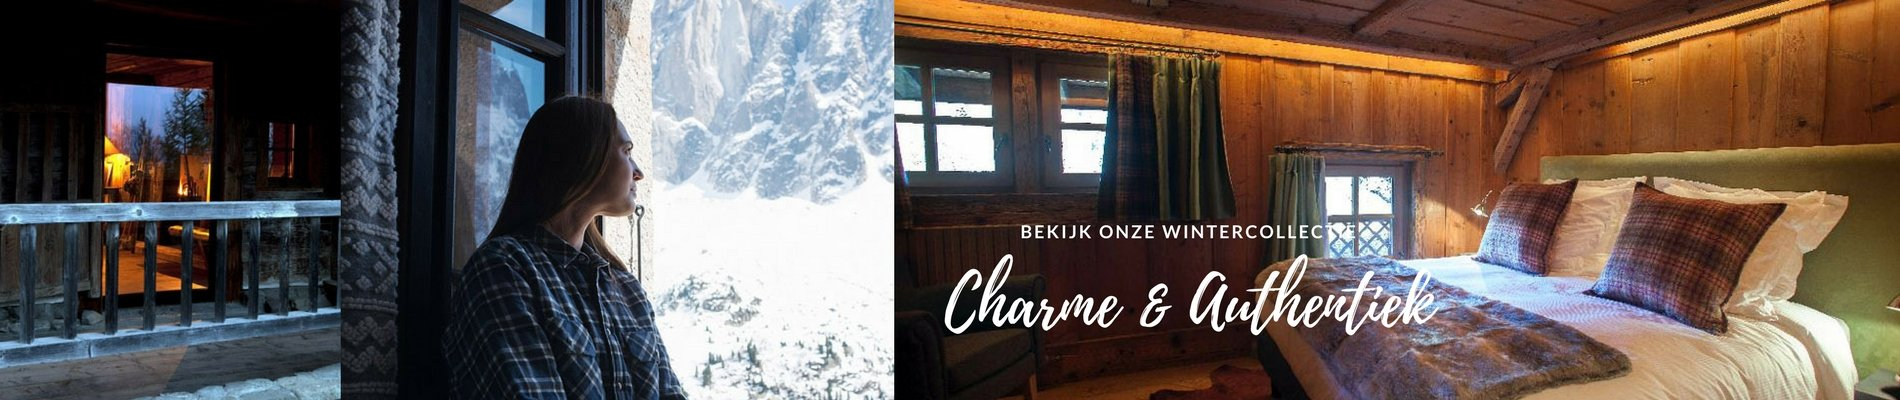 banner 1900 x 400 charme wintersport